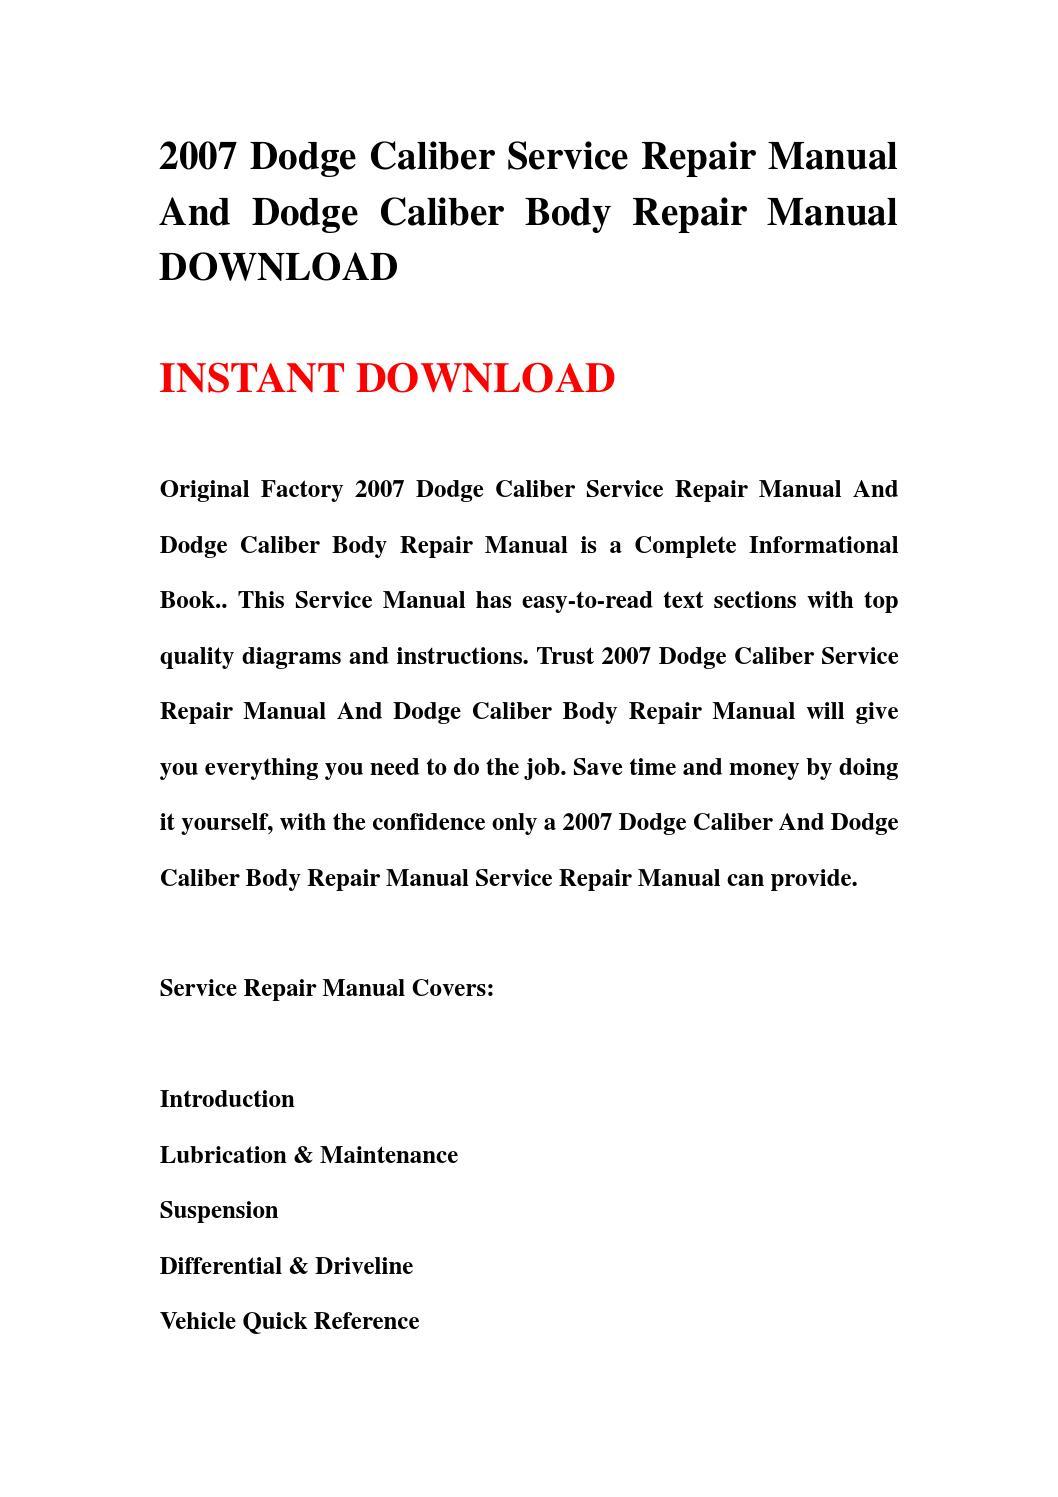 2007 dodge caliber horn wiring diagram teeth with numbers and names service repair manual